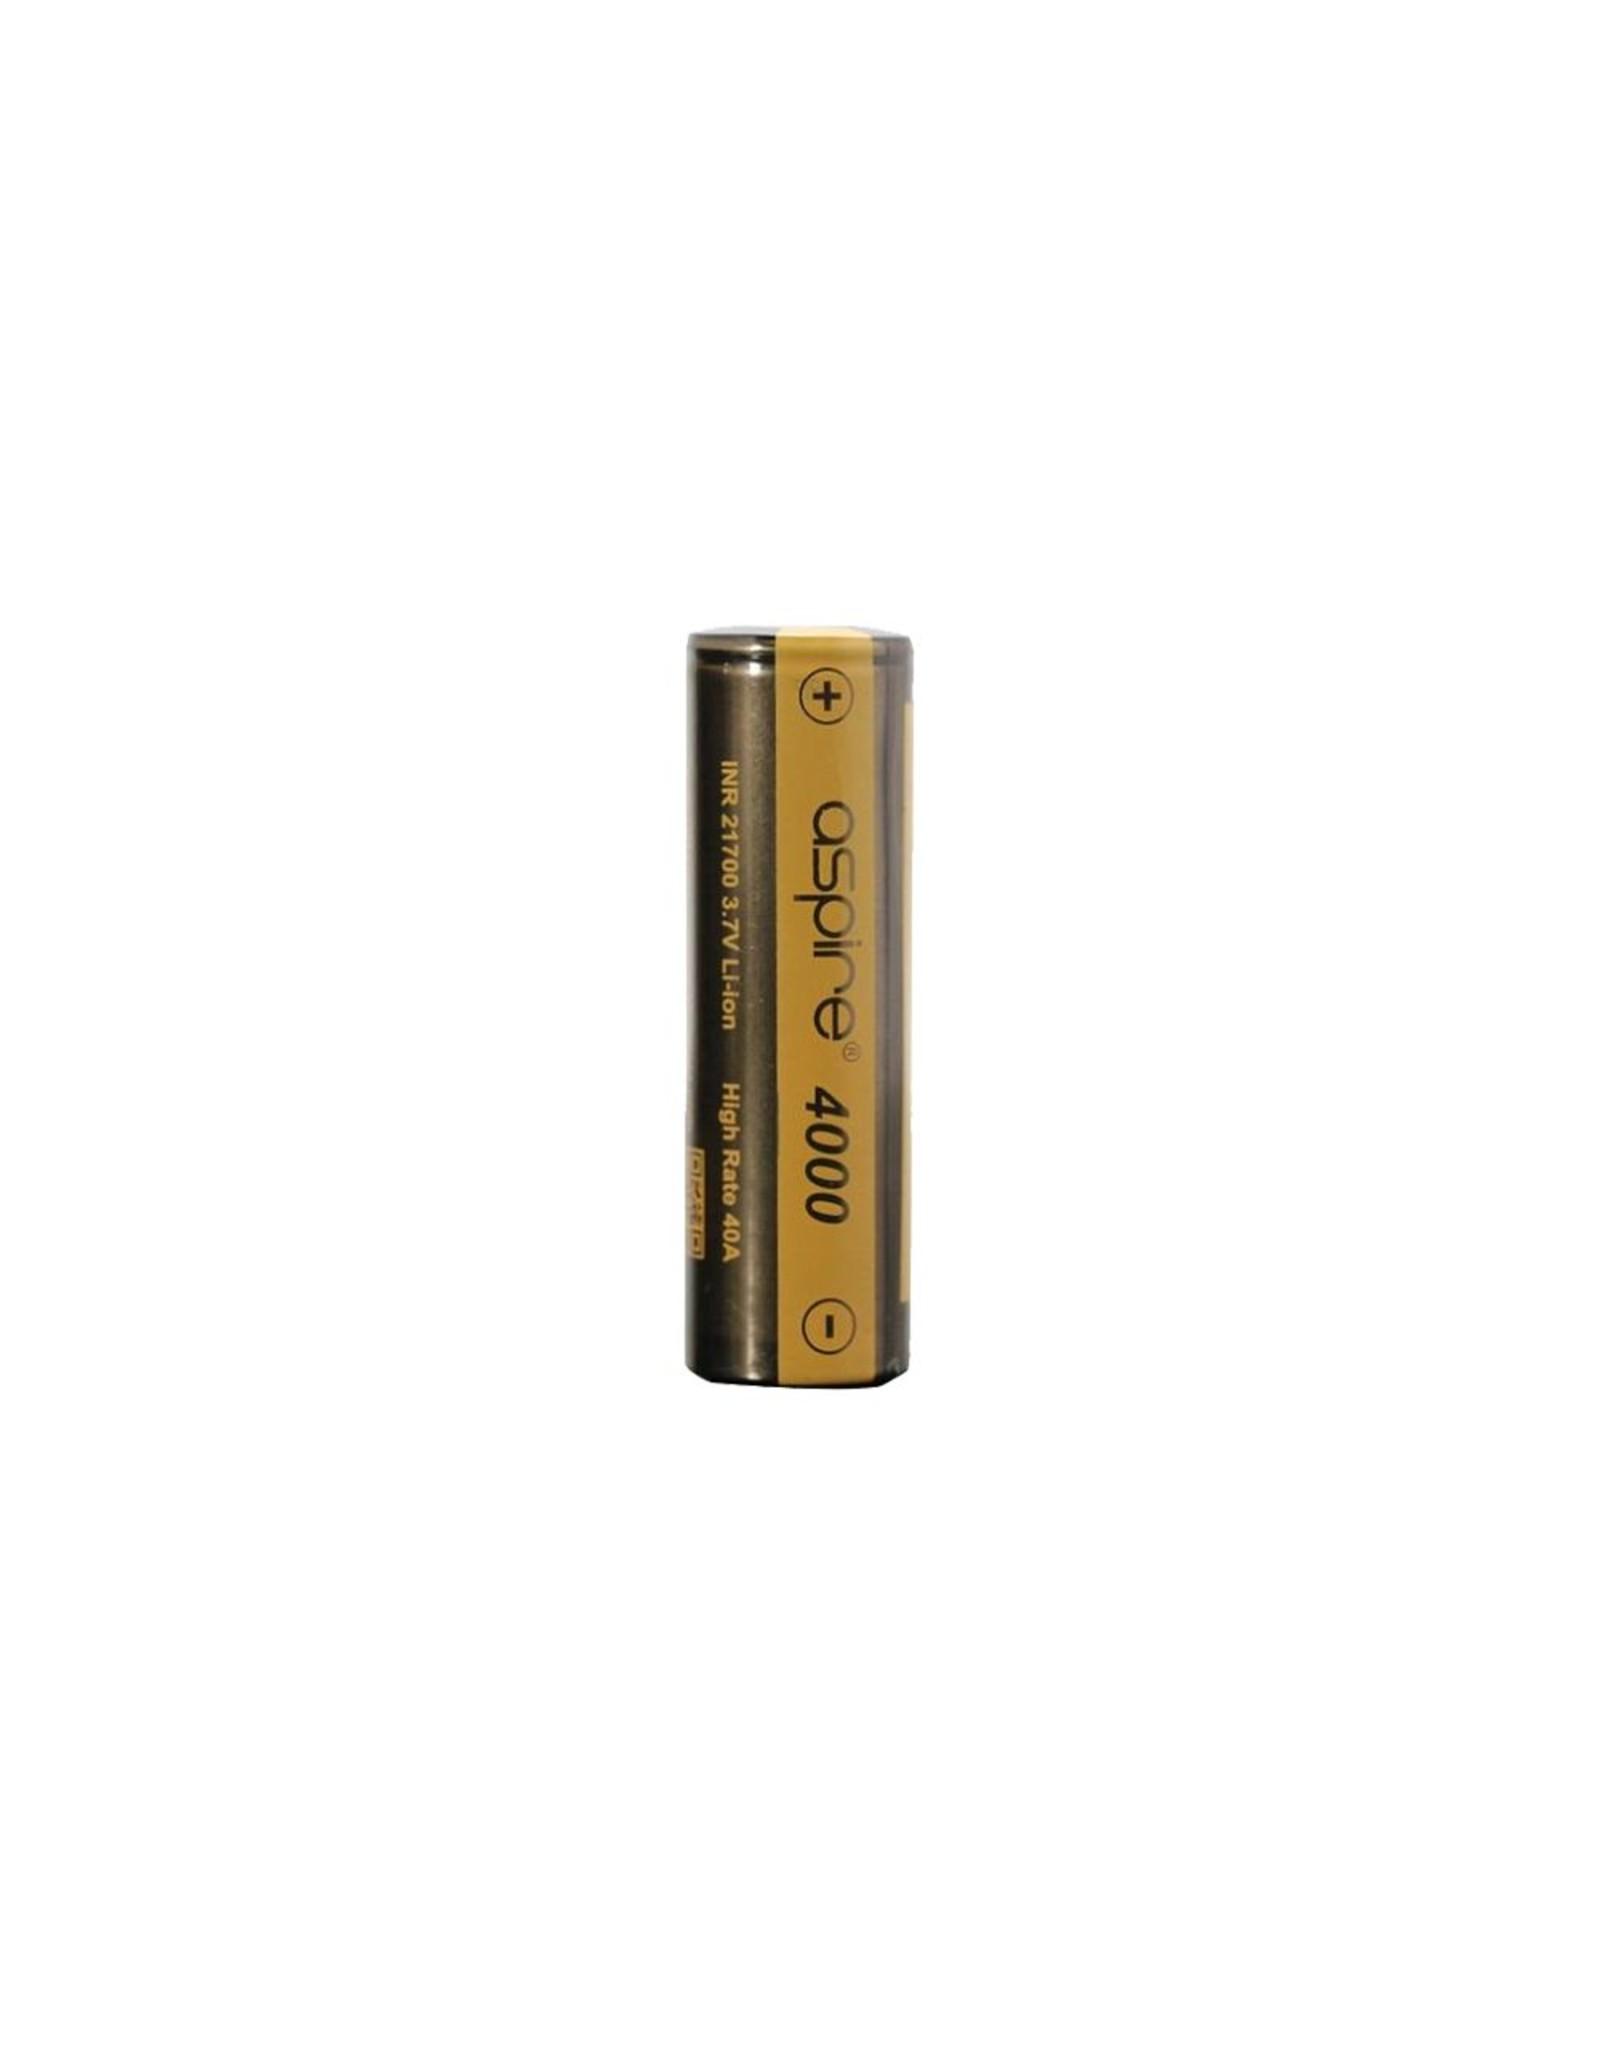 Aspire Aspire 21700 INR 4000 mAh battery